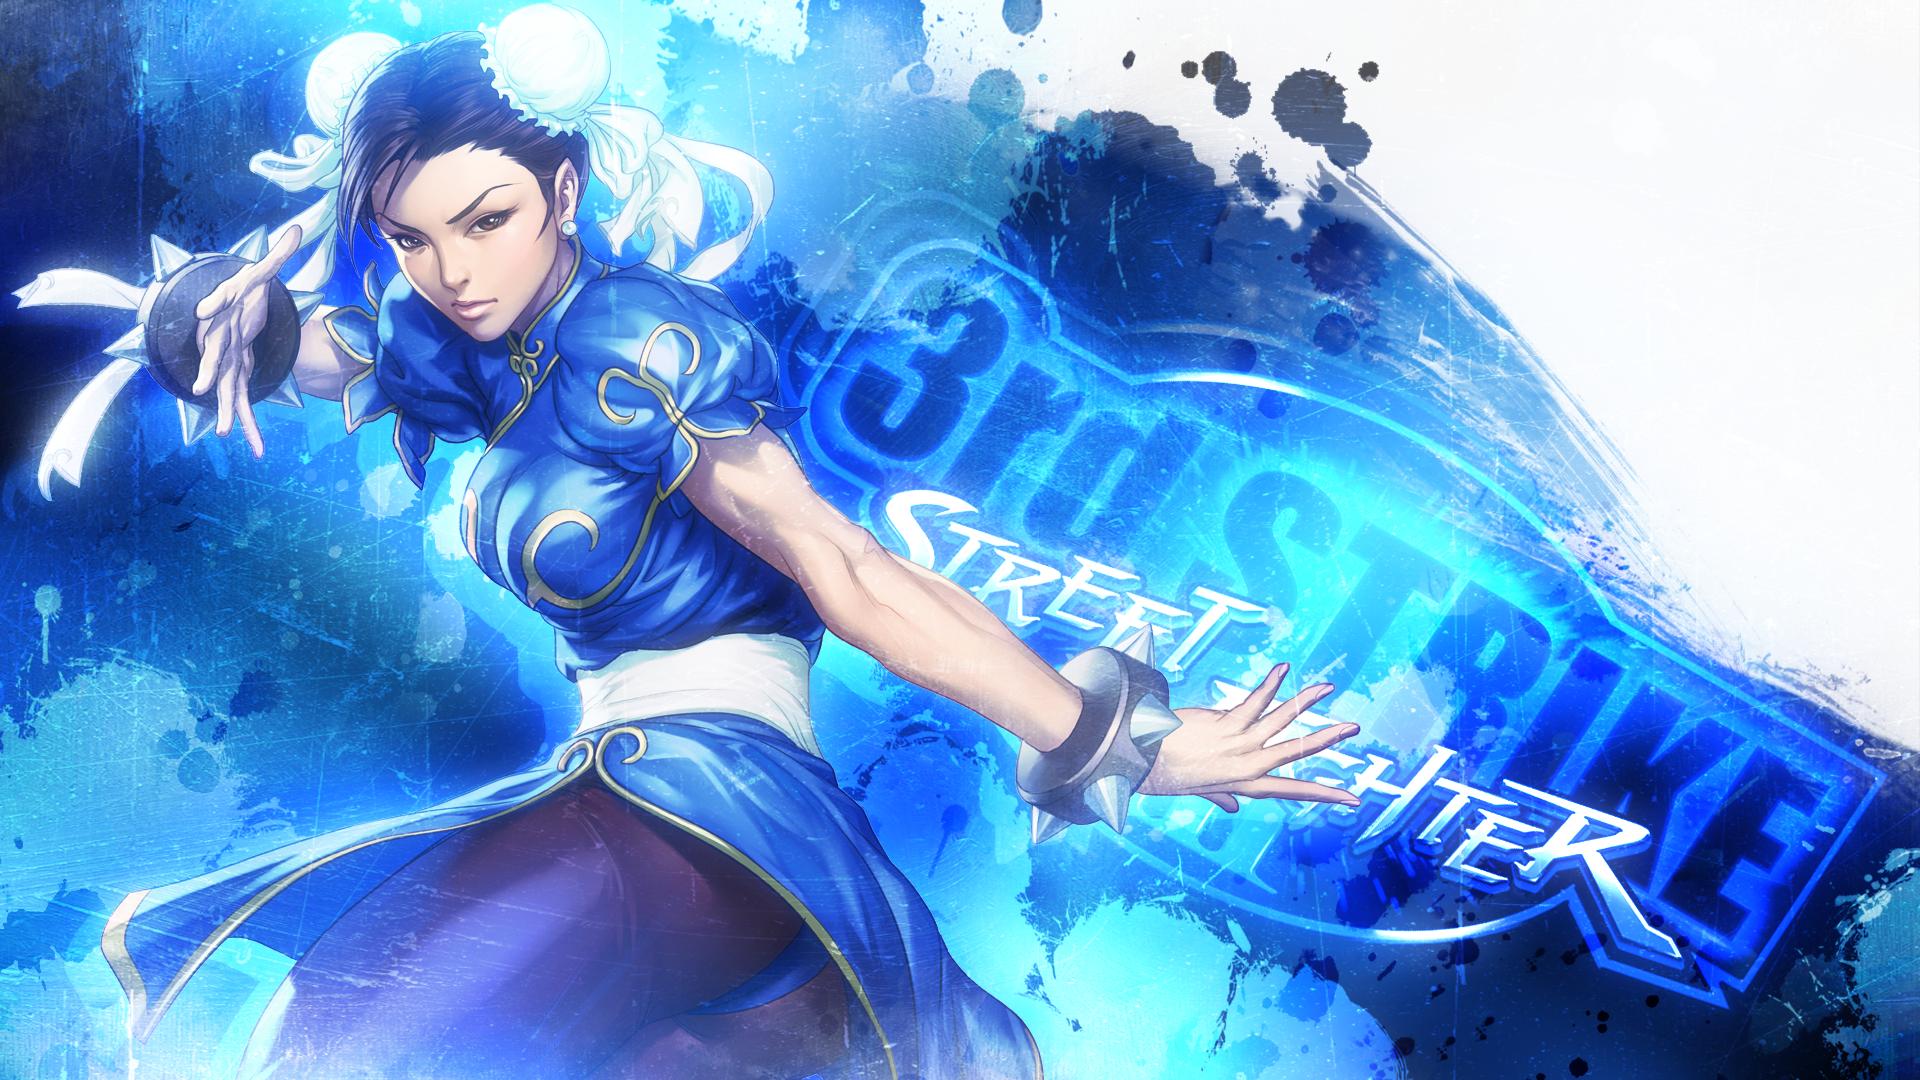 Chun li - Street Fighter Wallpaper (24489758) - Fanpop